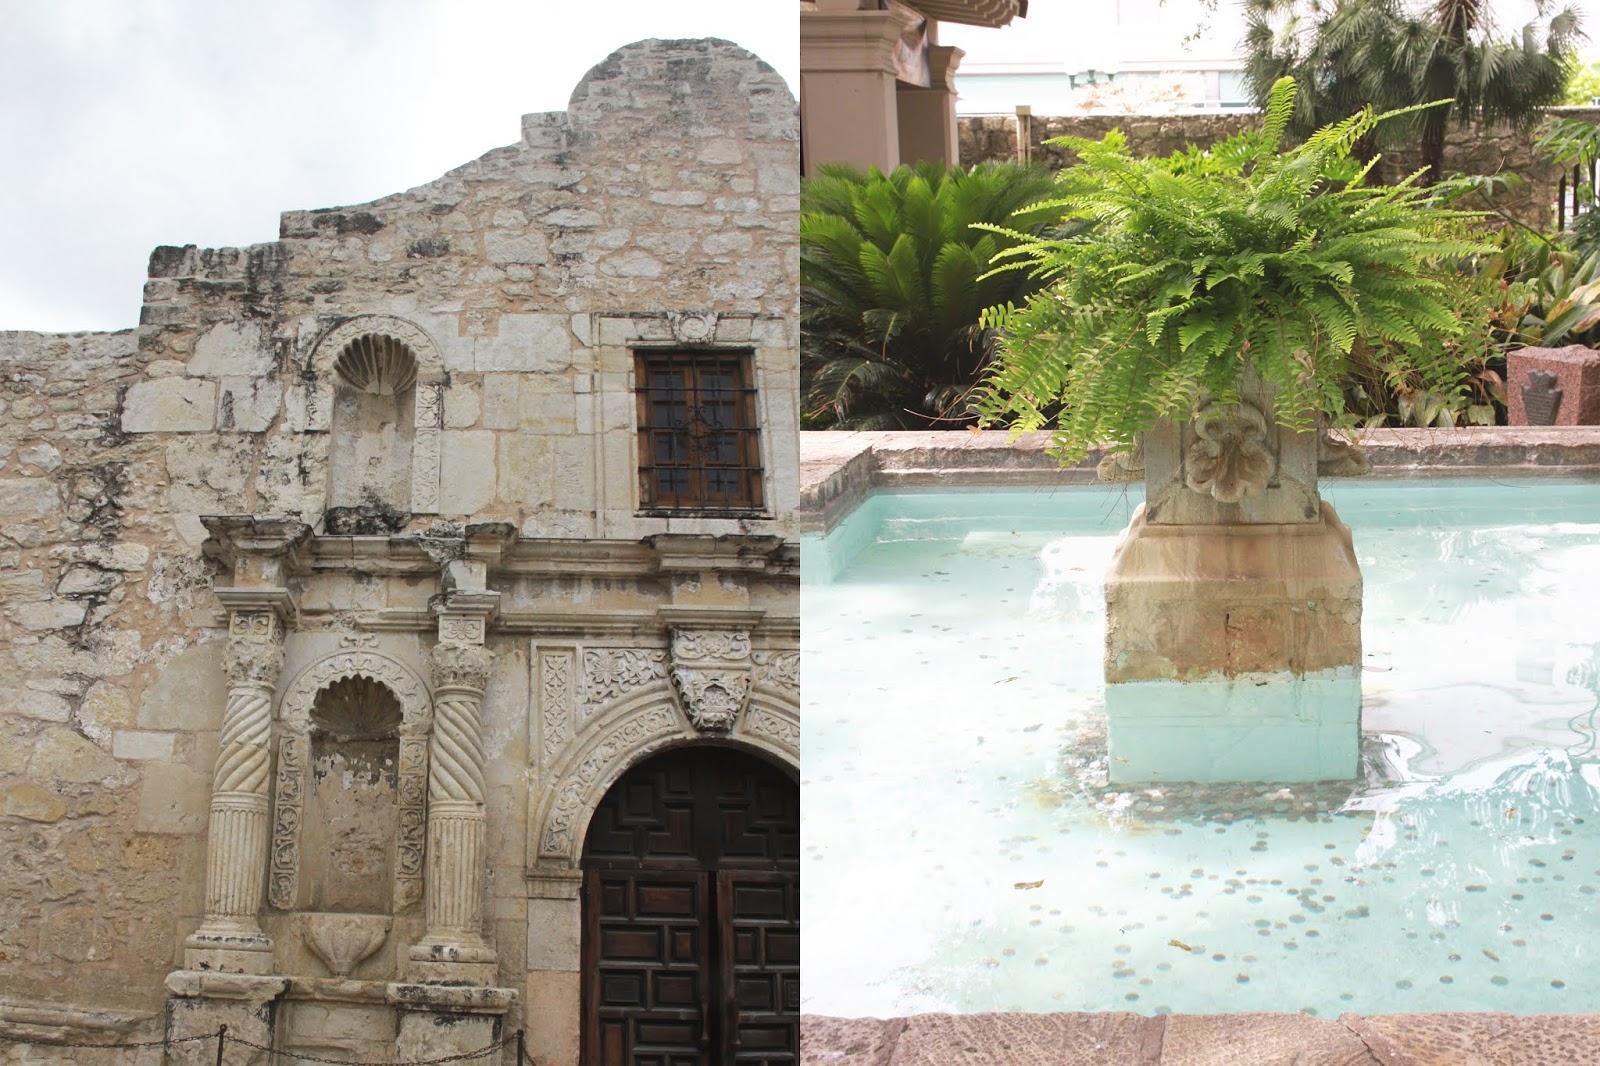 the alamo, Alamo, Alamo San Antonio Texas, Alamo tours, when to visit the Alamo, Alamo parking, Alamo wait times